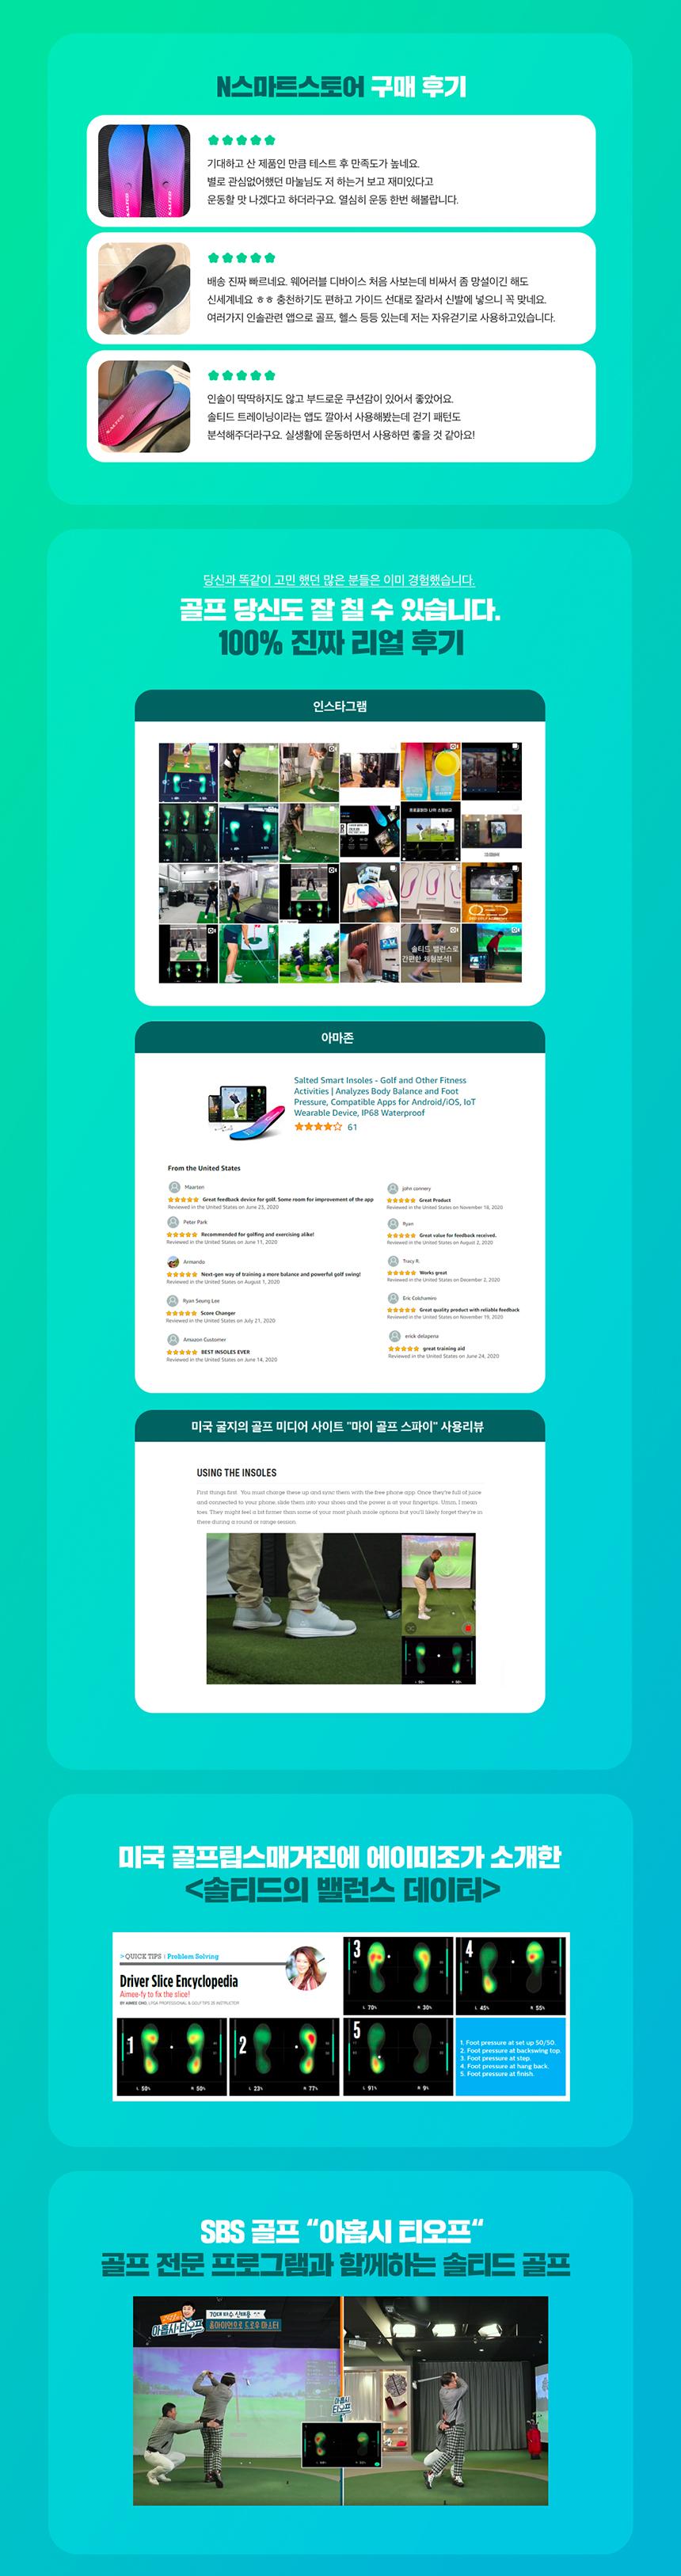 new_golf_05.jpg